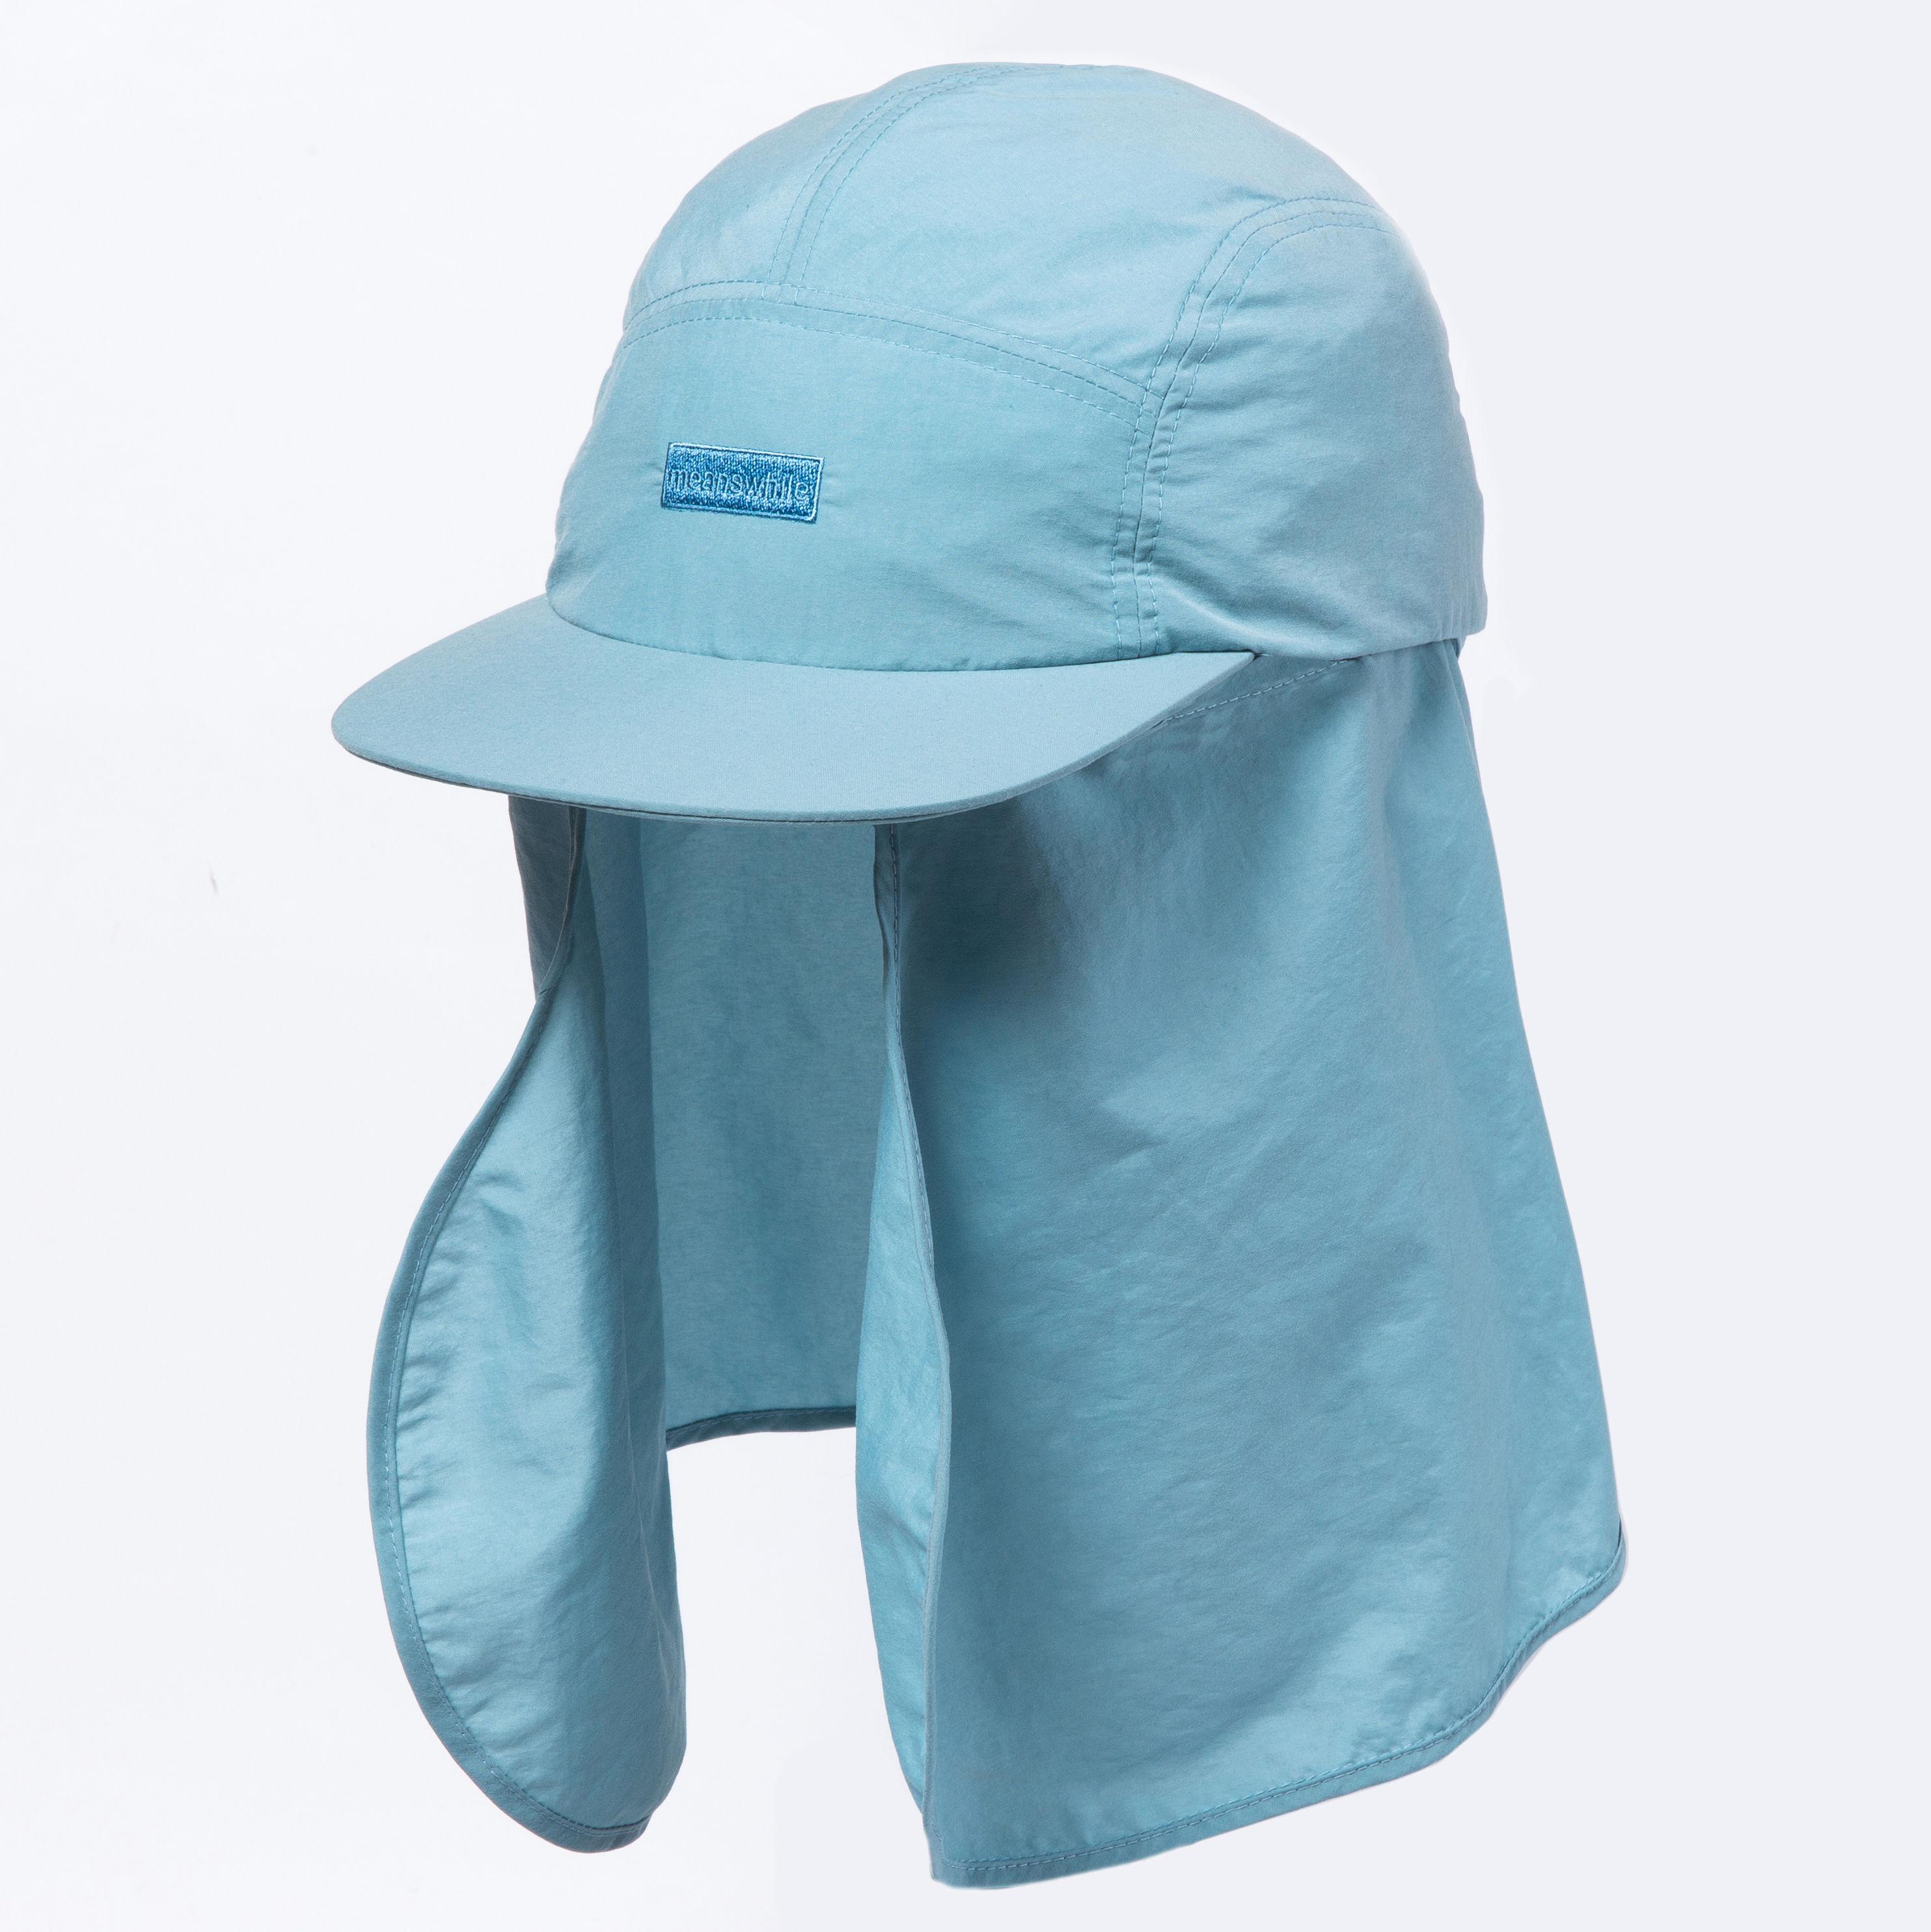 Shade Cover Jet Cap/SCRUB BLUE